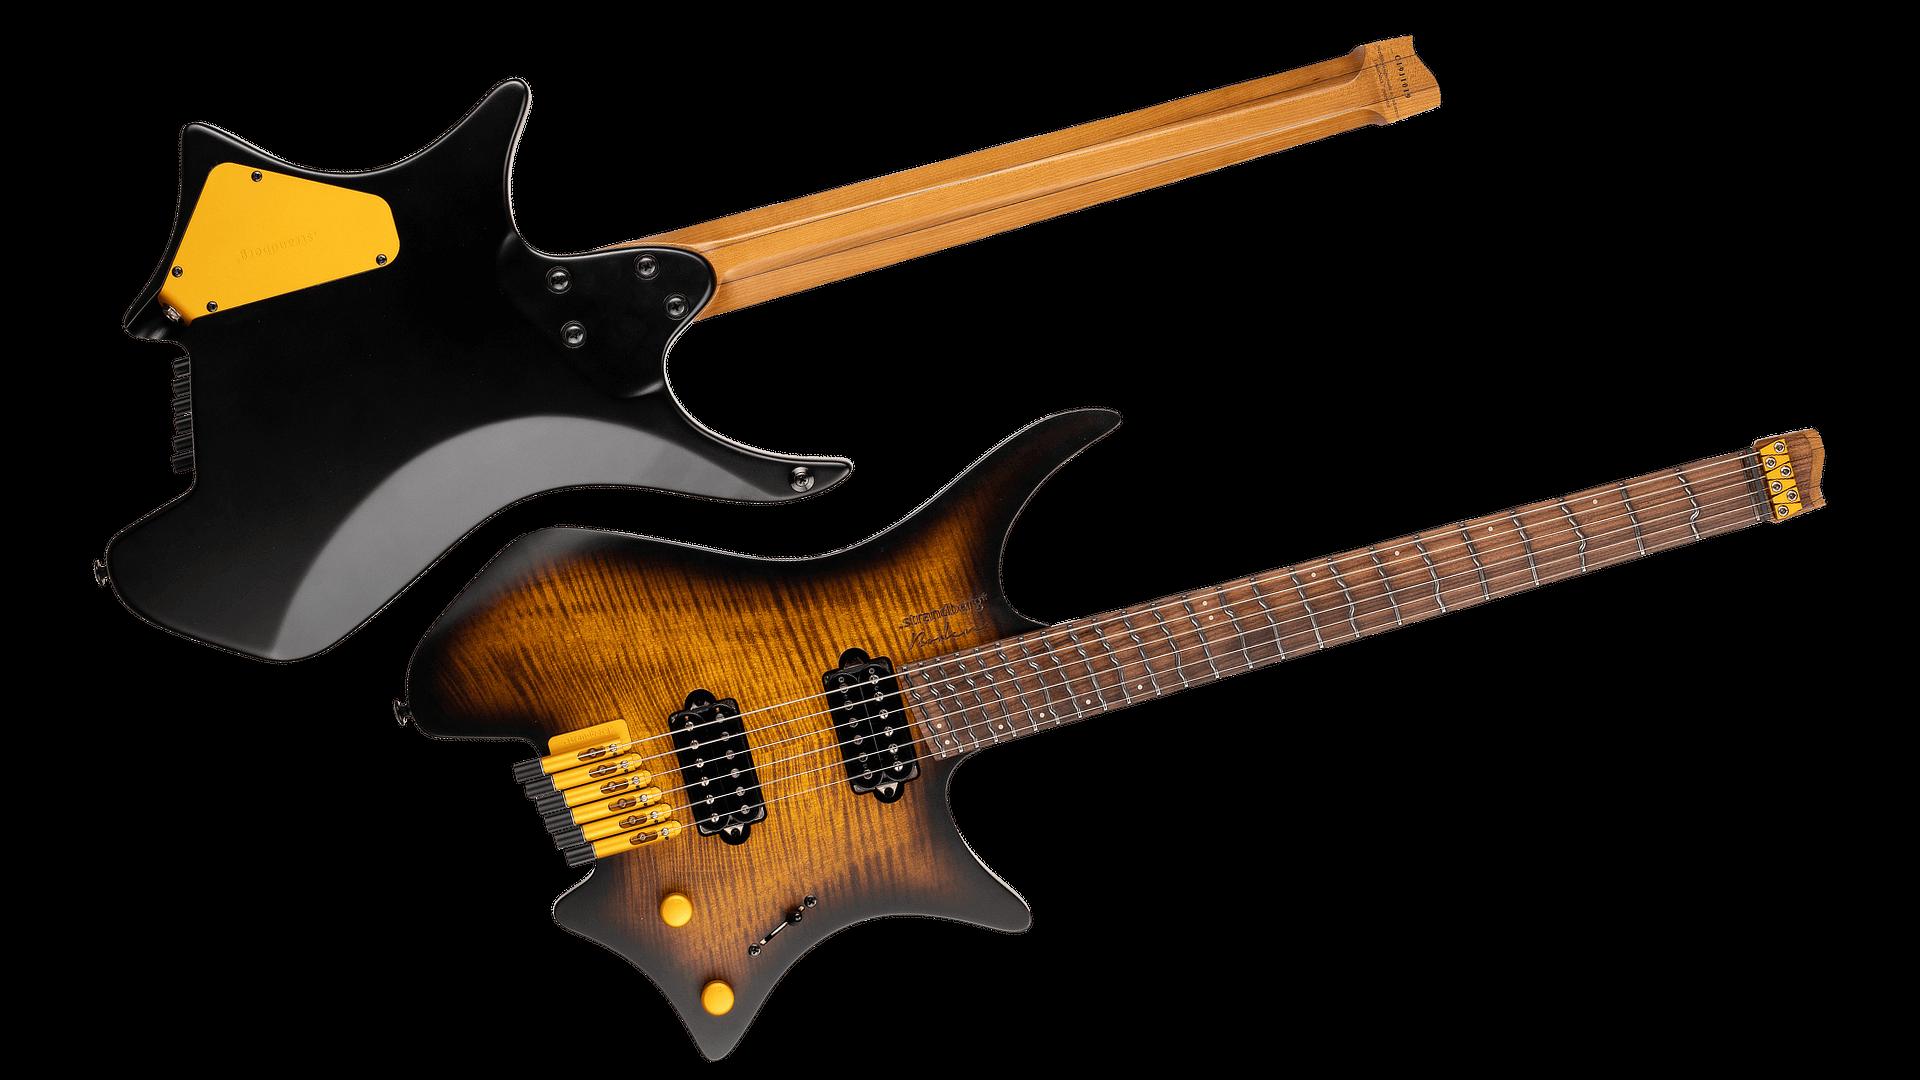 True Temperament Brown Burst 6 string headless guitar front and back view EndureNeck Fretboard